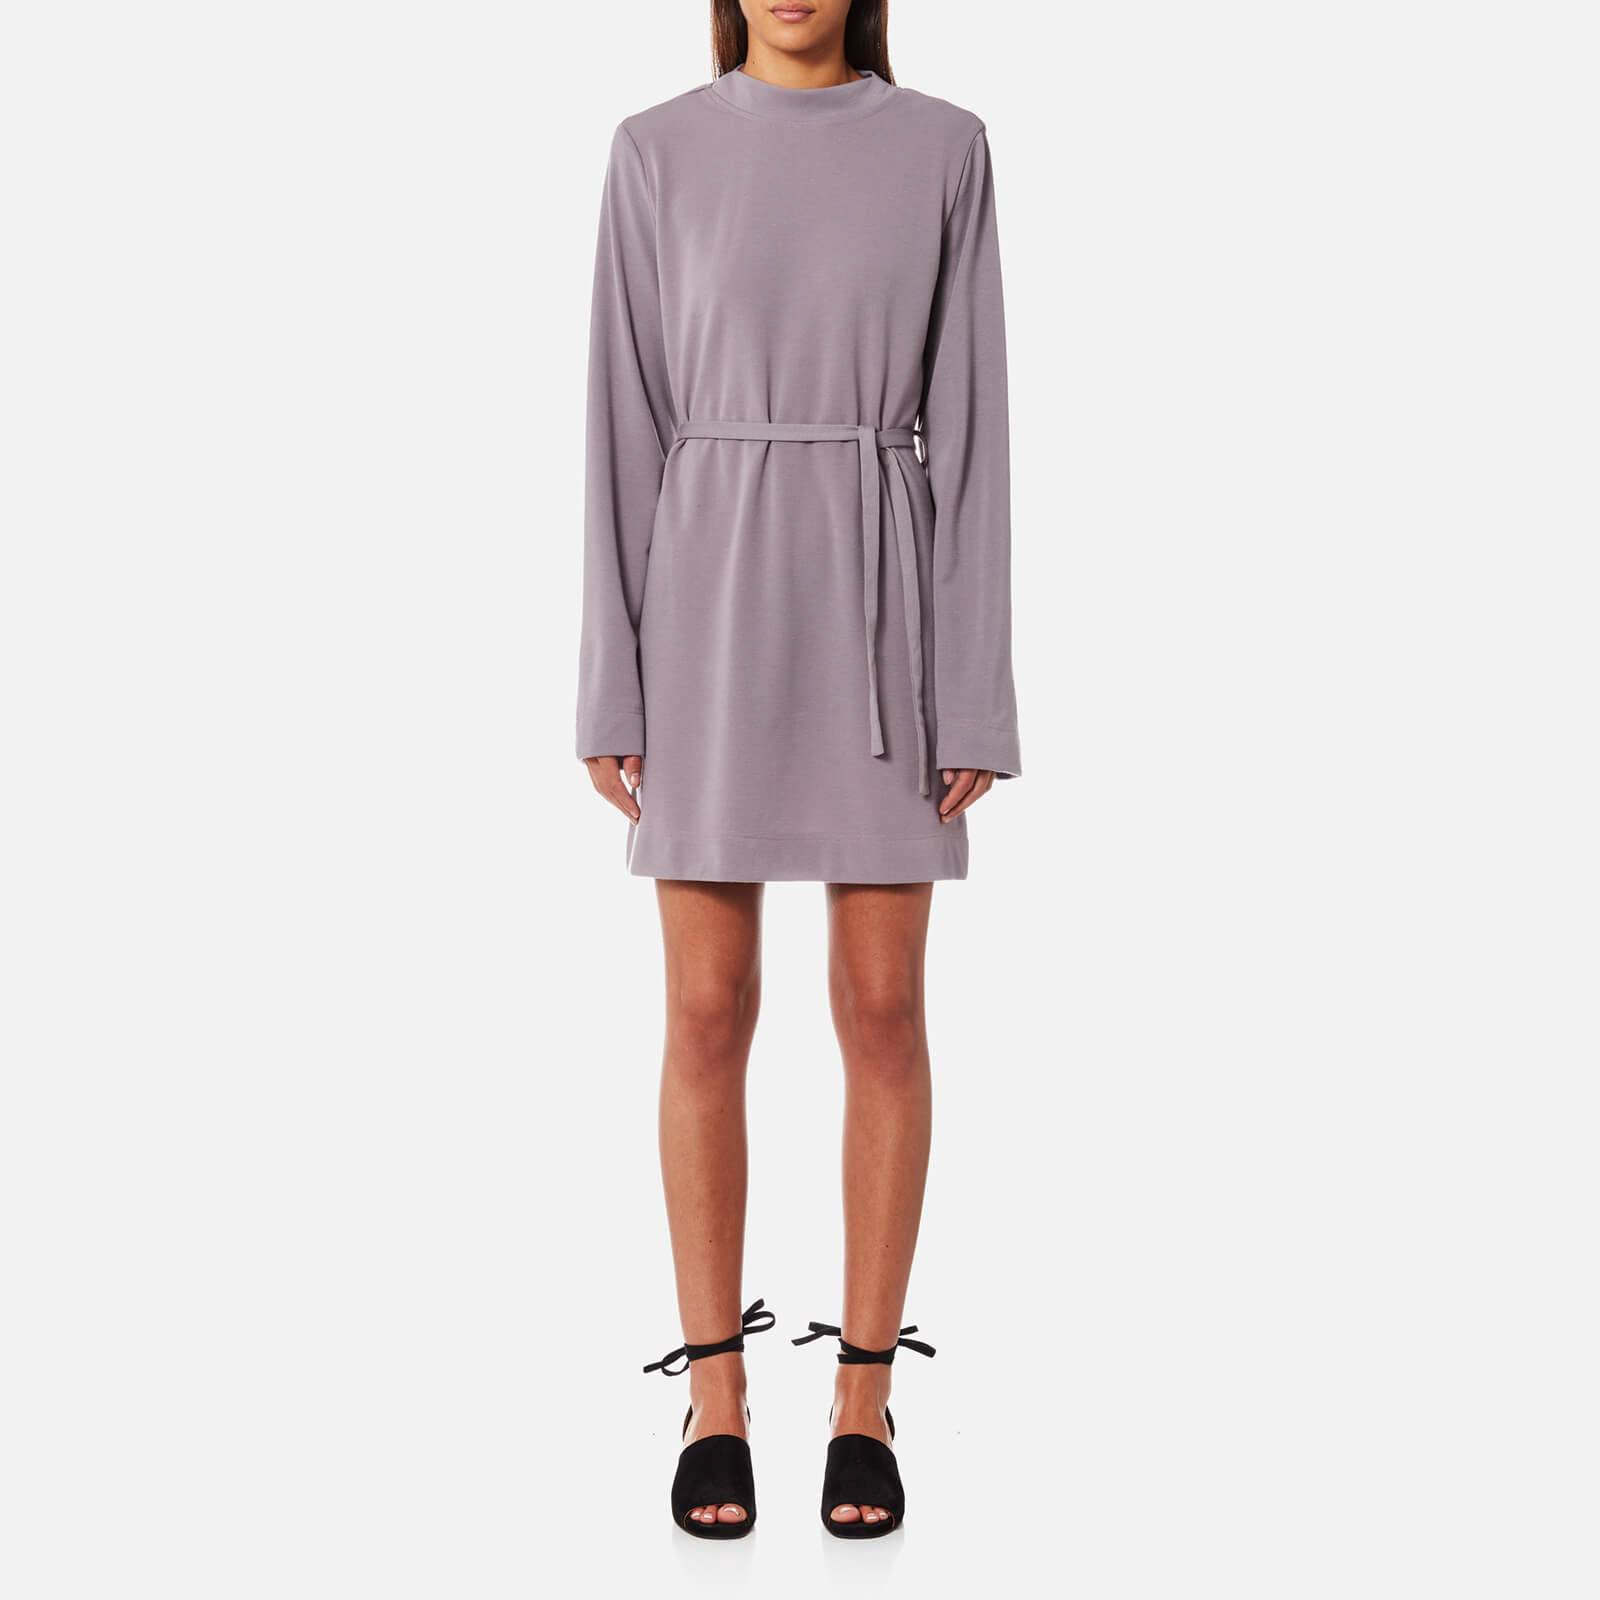 House of Sunny Women's Kicker T-Shirt Long Sleeve Dress - Sweet Lilac - UK 12 - Purple